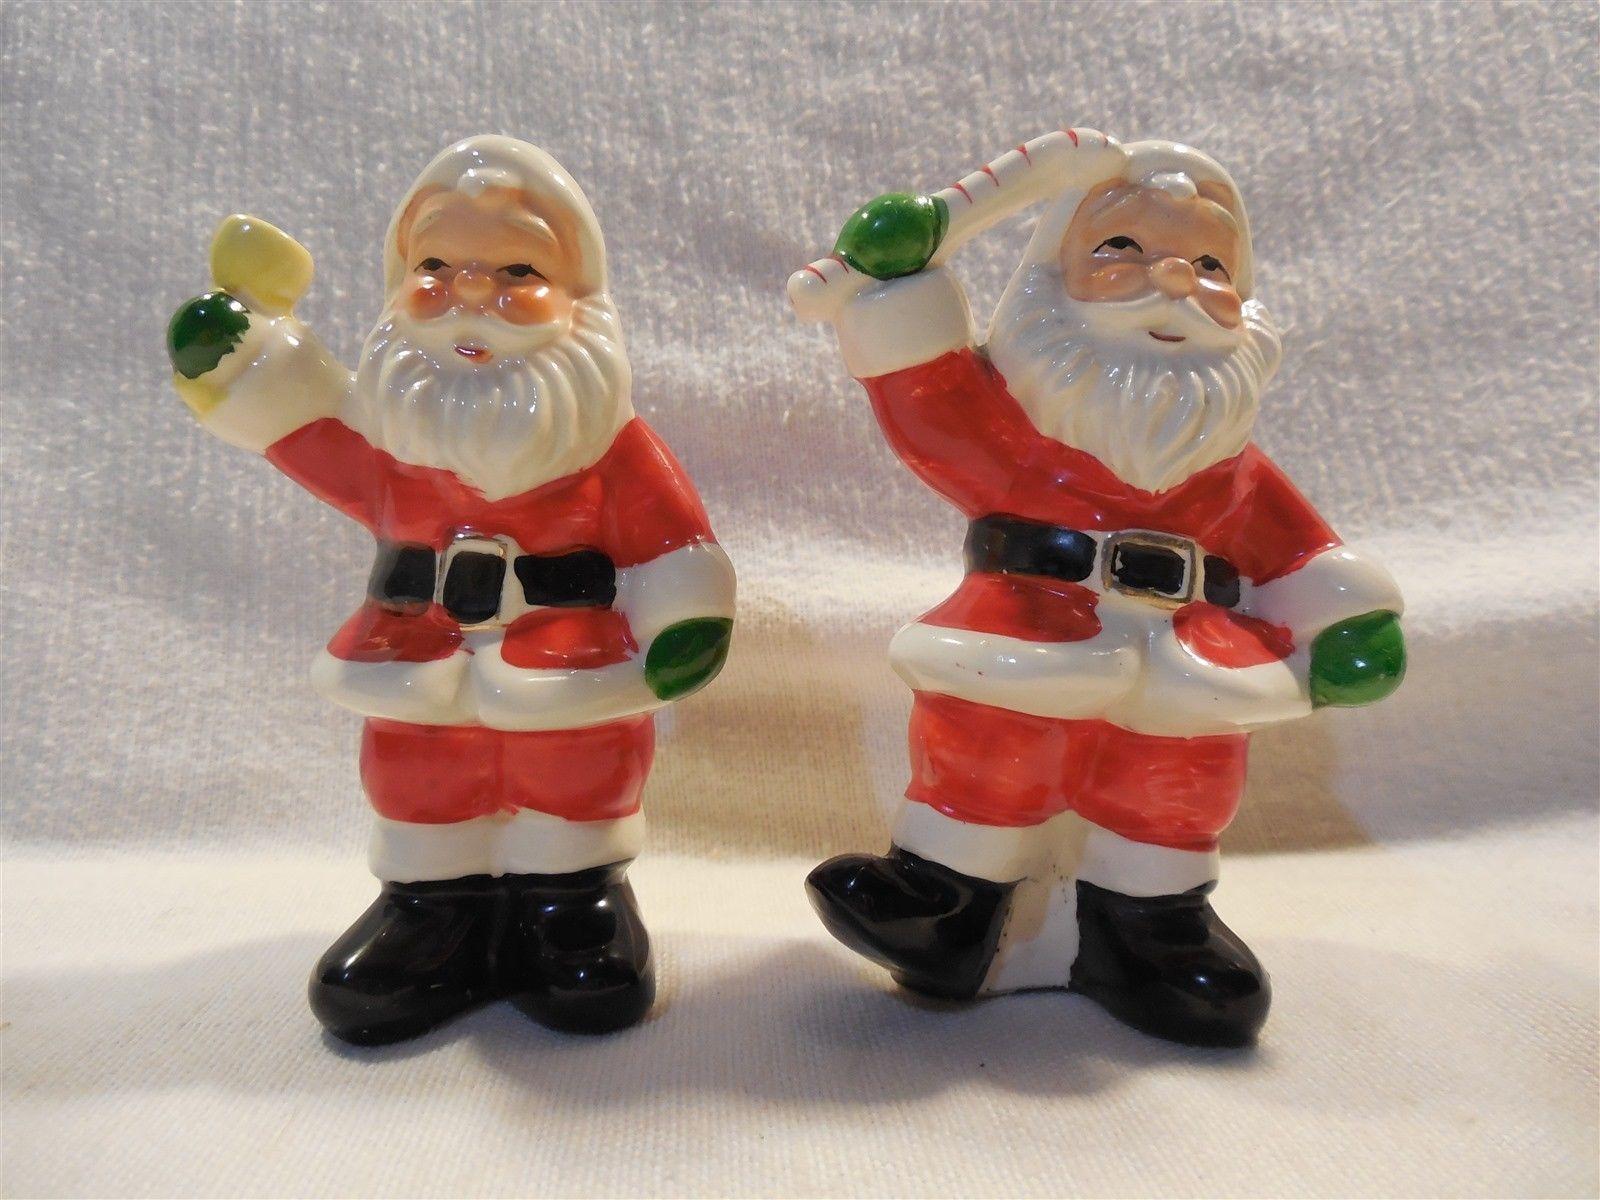 e2c0bc1d826 Vintage Napco Japan Ceramic Christmas Santa and similar items